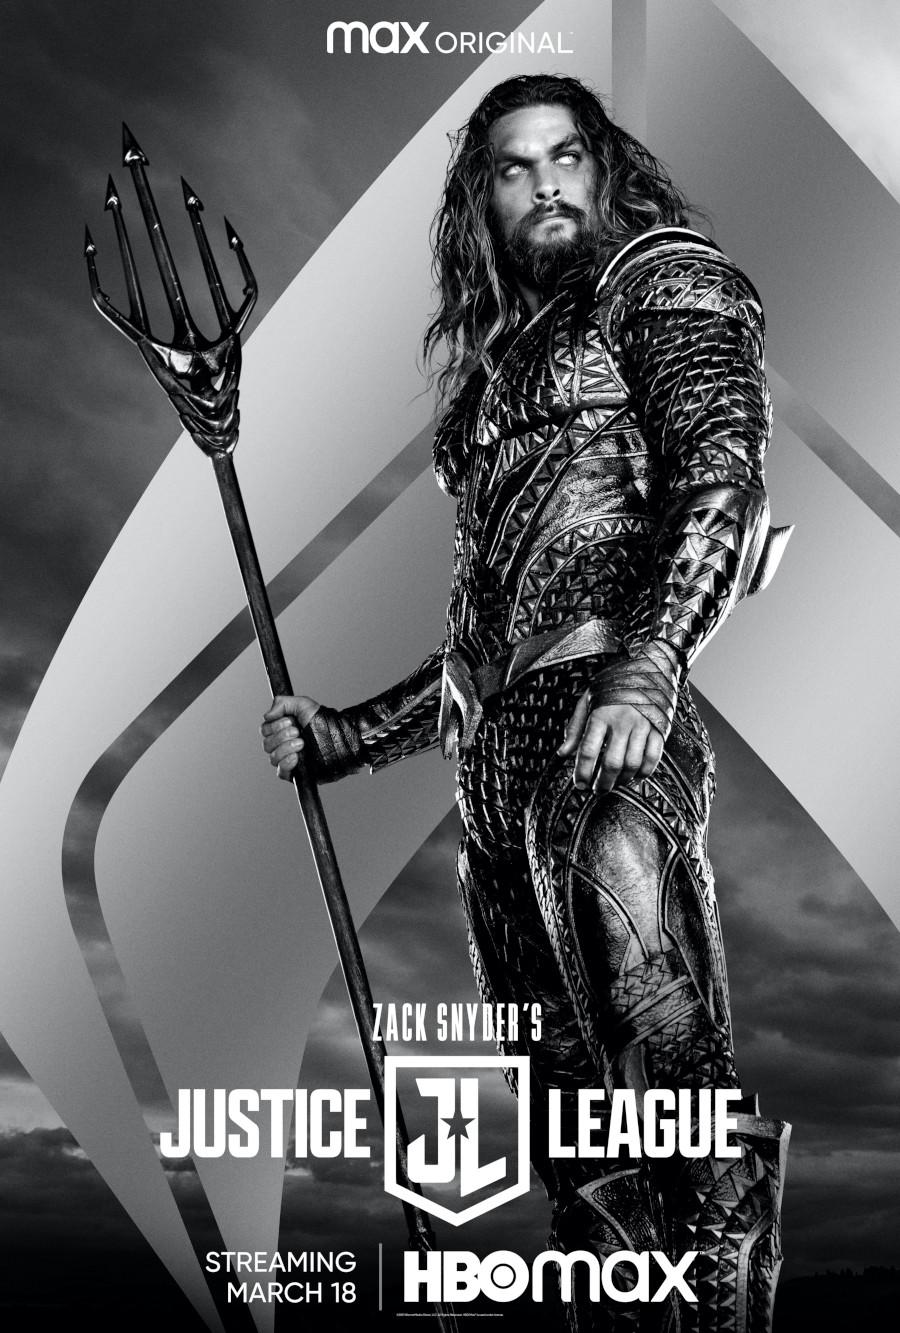 Jason Momoa Aquaman Poster Zack Snyder's Justice League